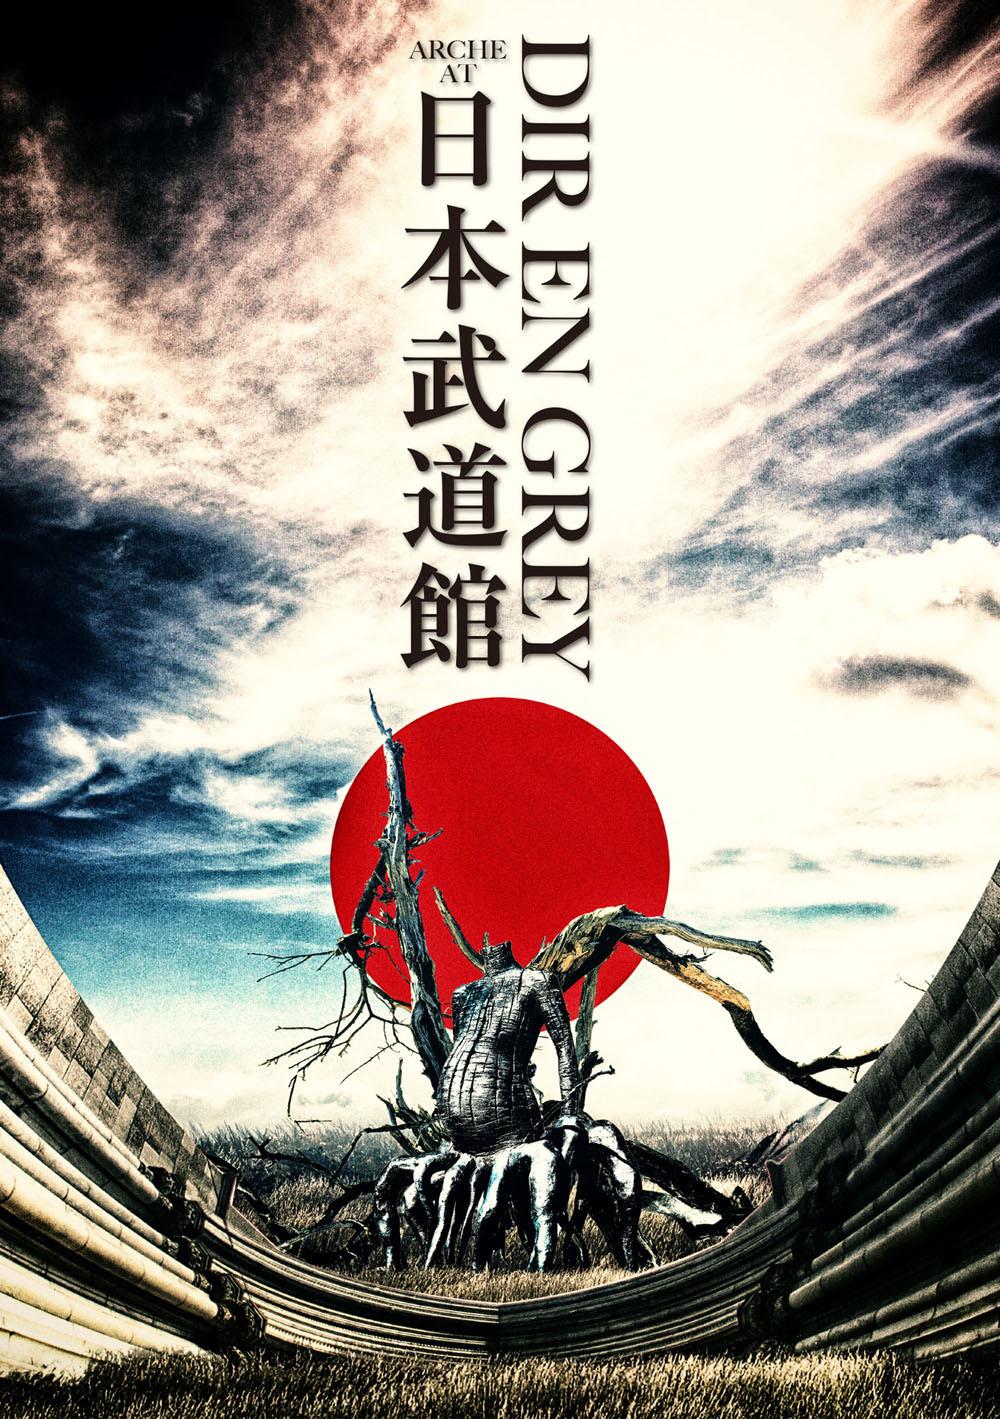 DIR EN GREY LIVE DVD『ARCHE AT NIPPON BUDOKAN』